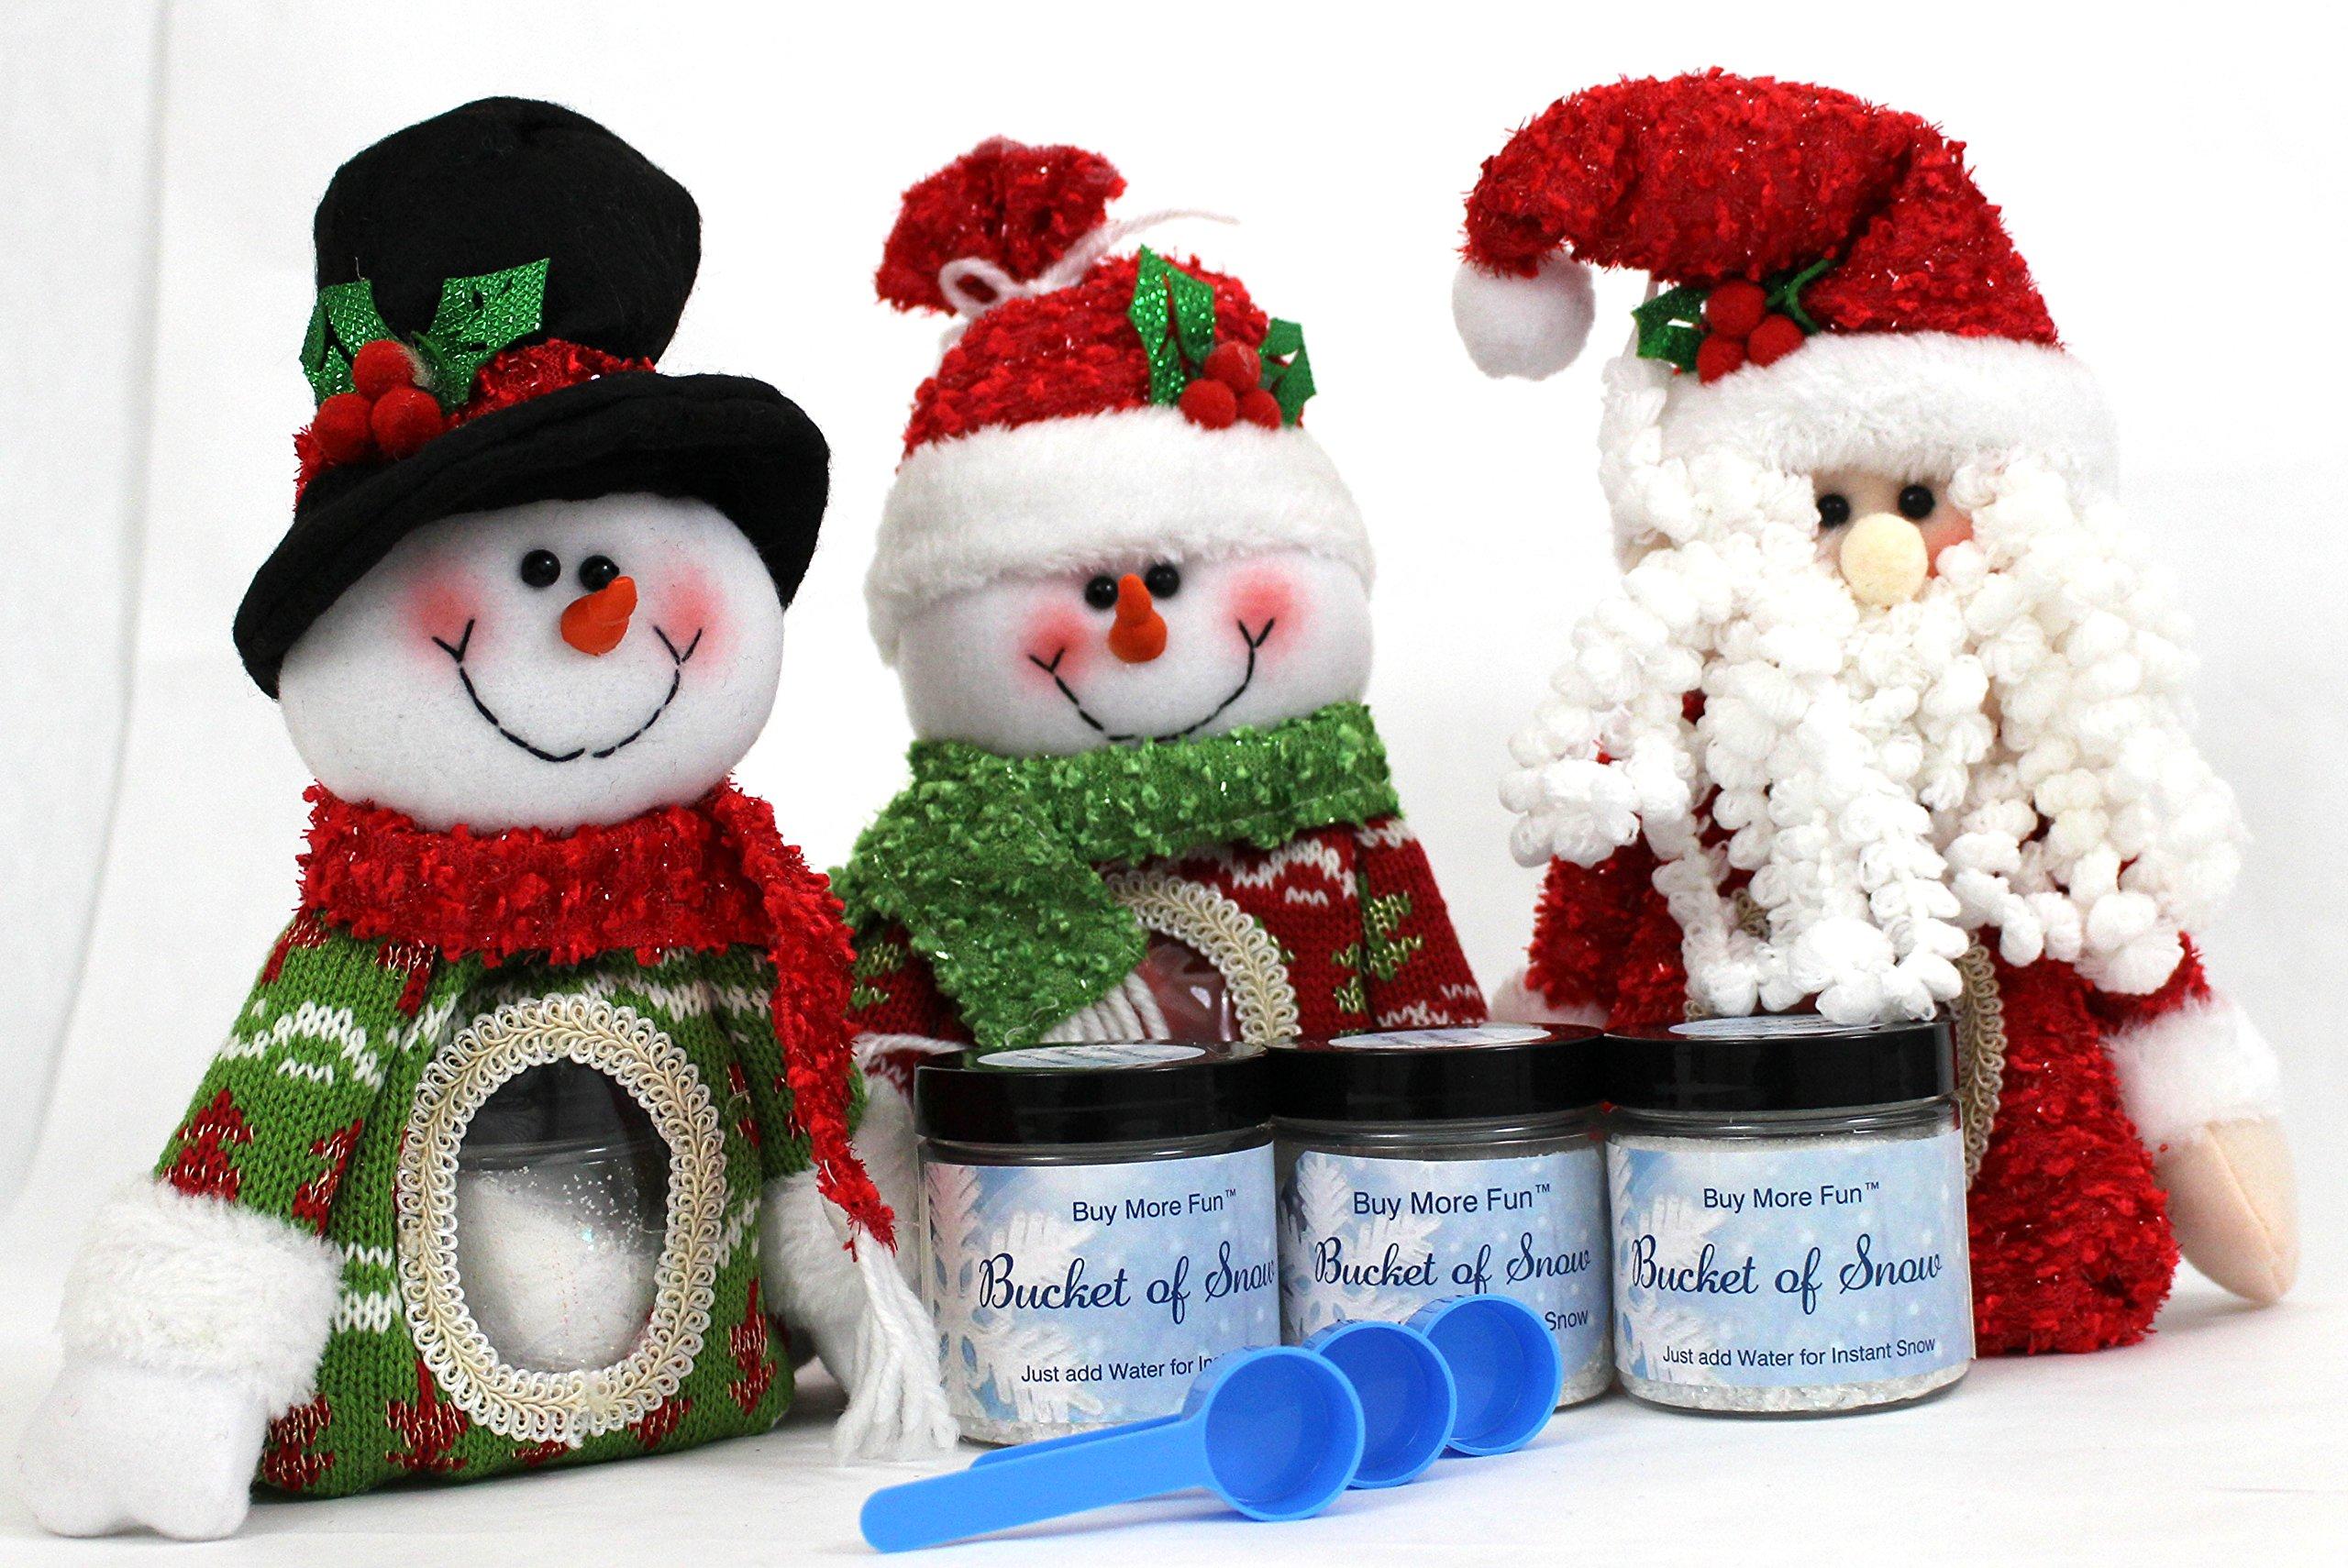 Bundle of Three Santa Snowman Stocking Stuffer Bags with 4 ounce Bucket of Snow - Glitter Snow Powder